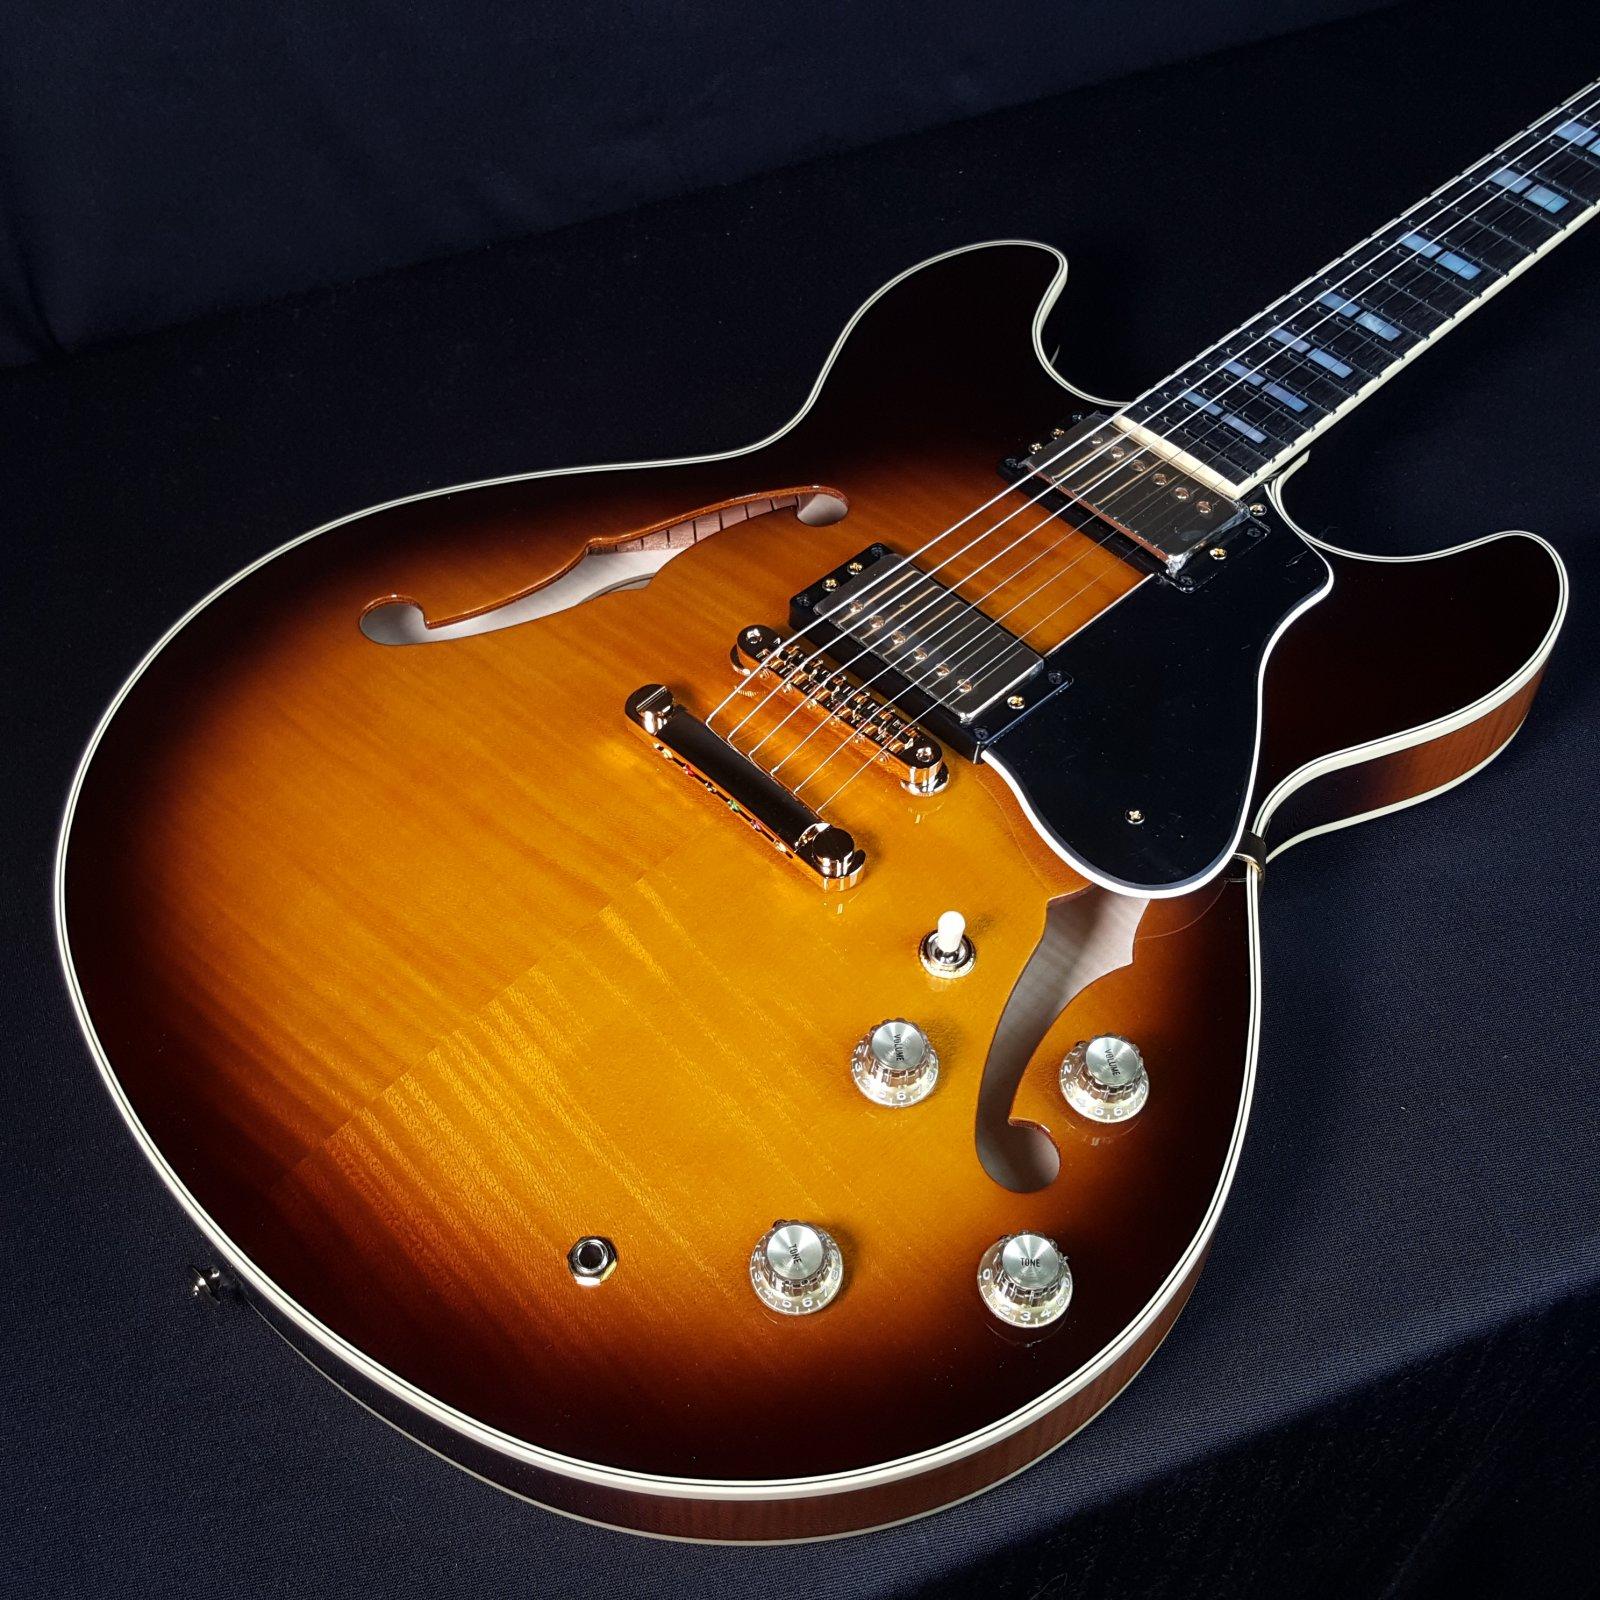 NEW Yamaha SA2200 Brown Sunburst 1QH025E Thinline Guitar With Gator Case